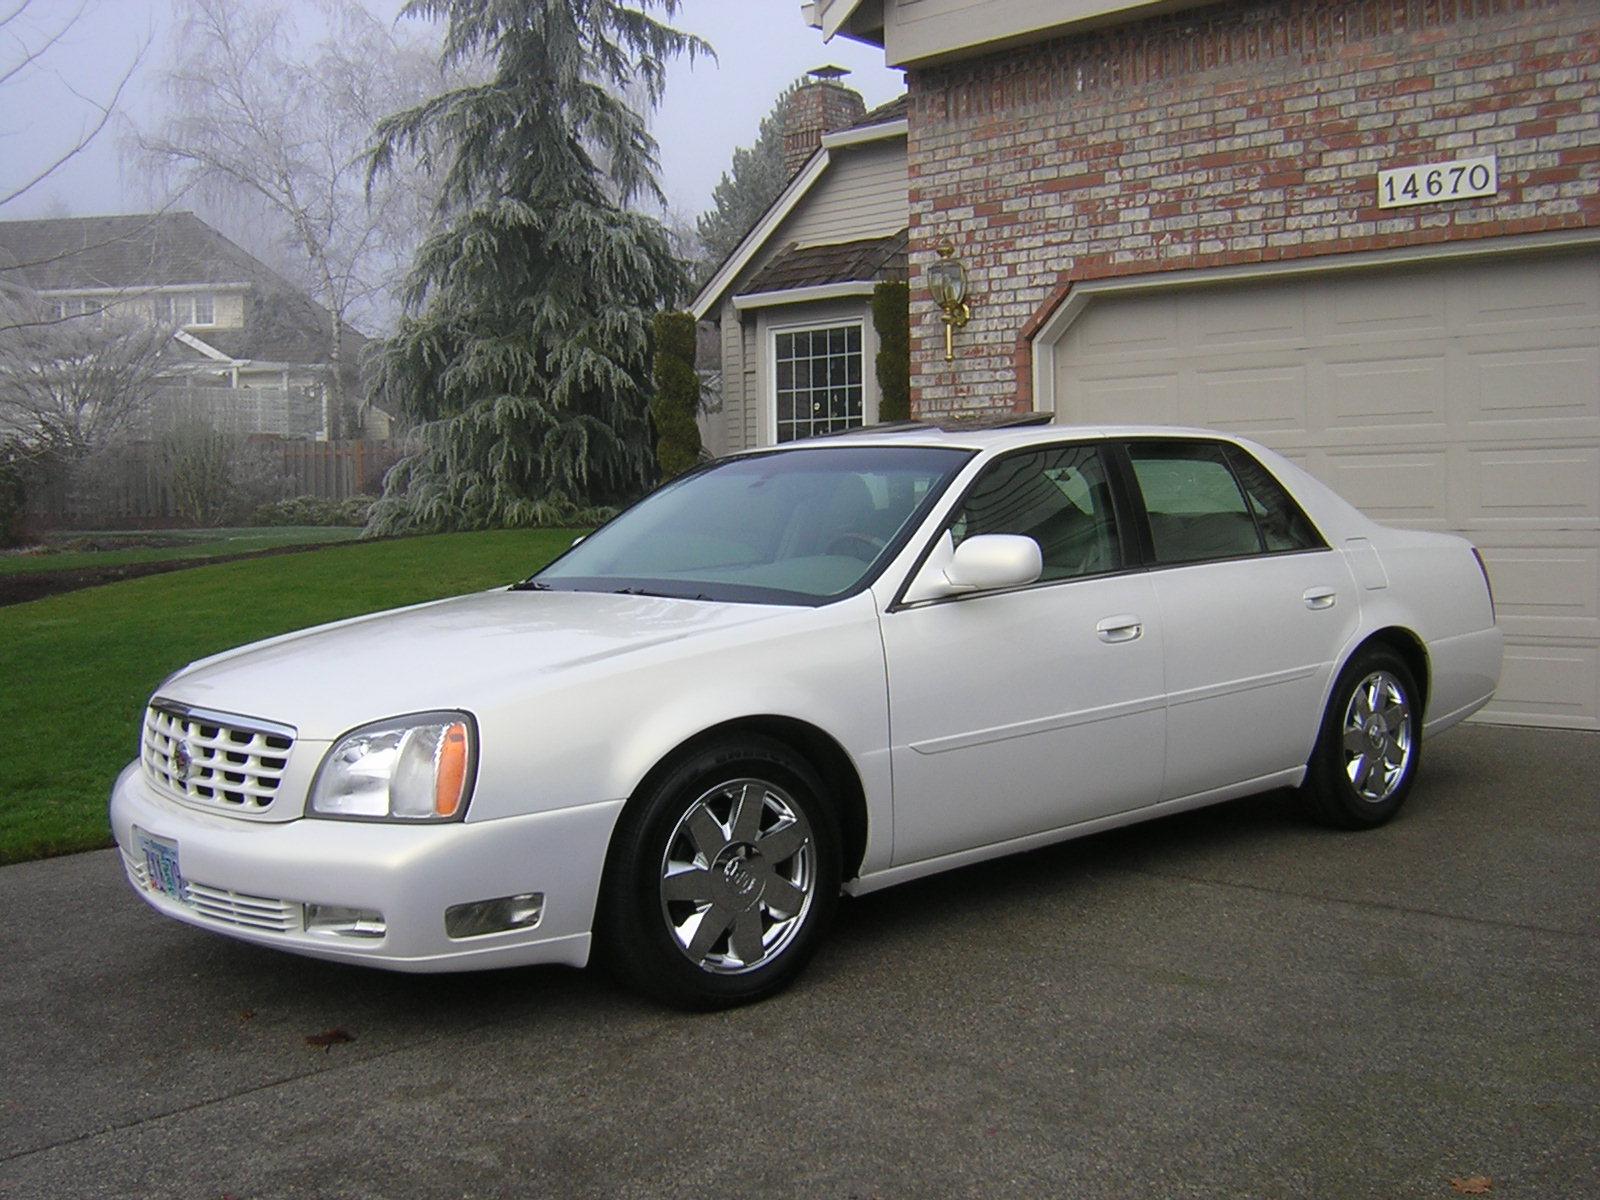 Cadillac Deville DTS:picture # 5 , reviews, news, specs, buy car